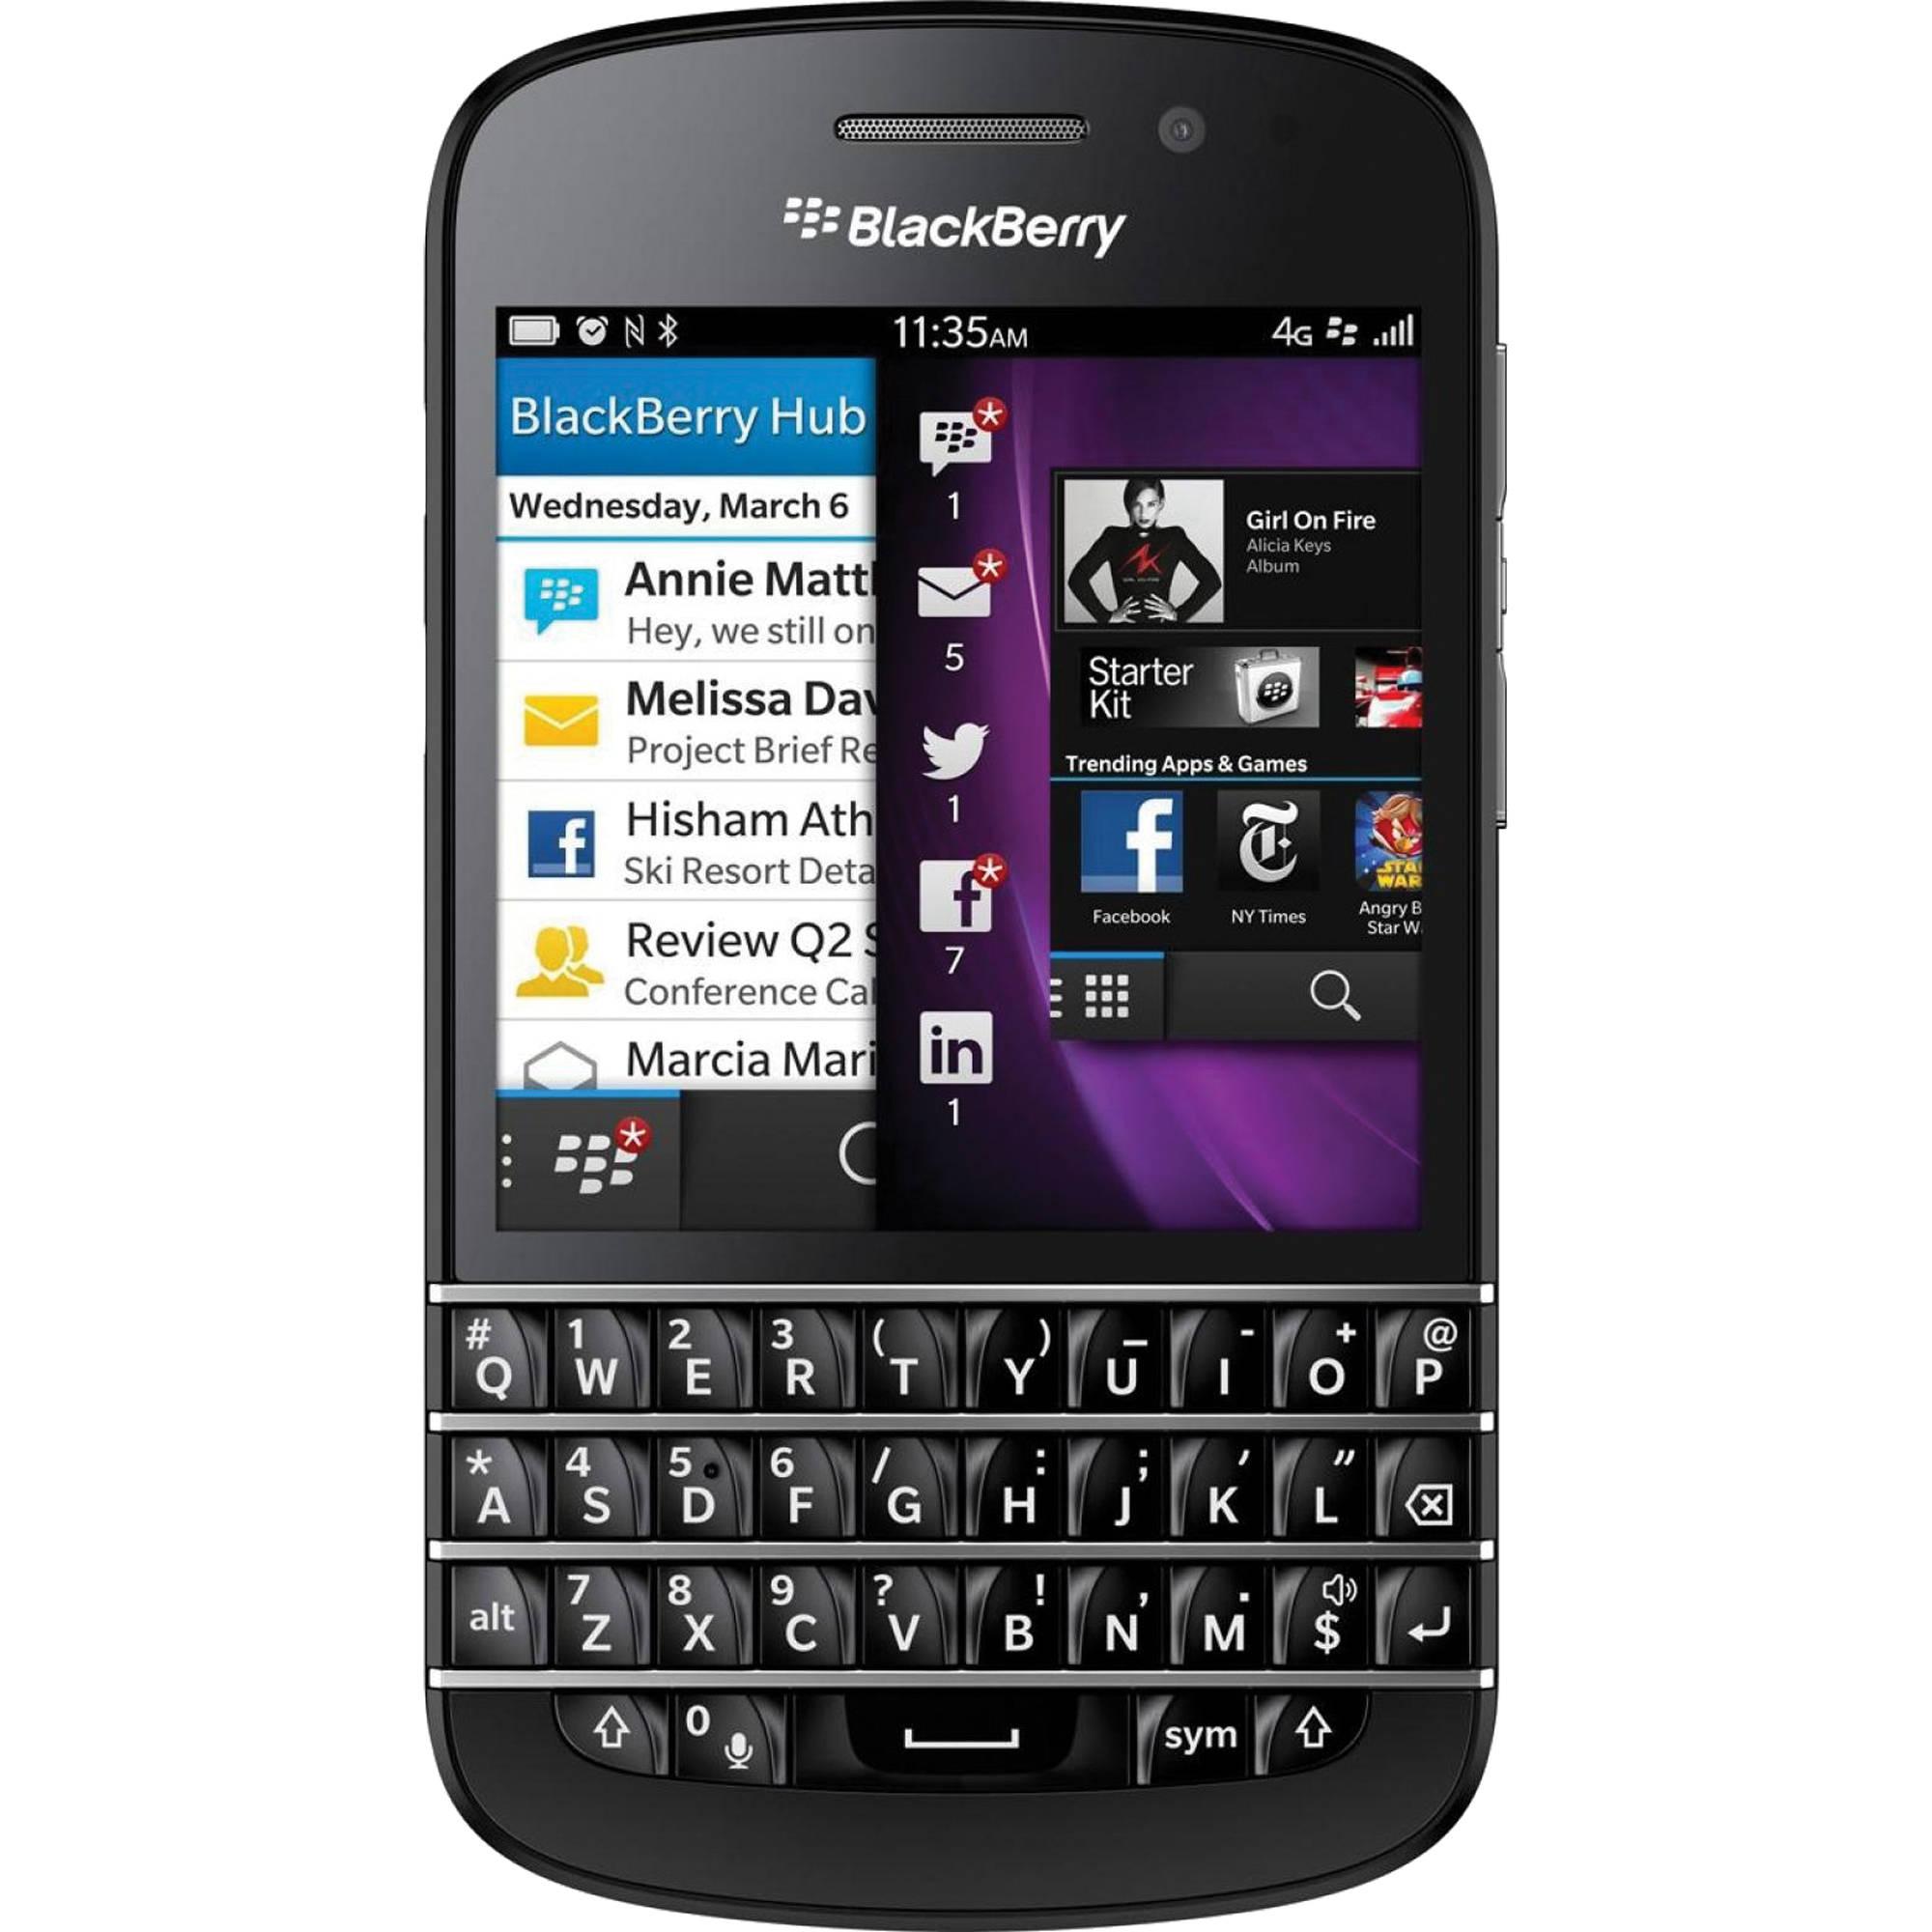 blackberry q10 sqn100 1 16gb at t branded smartphone q10 blk rh bhphotovideo com blackberry 10 user manual blackberry q10 user manual